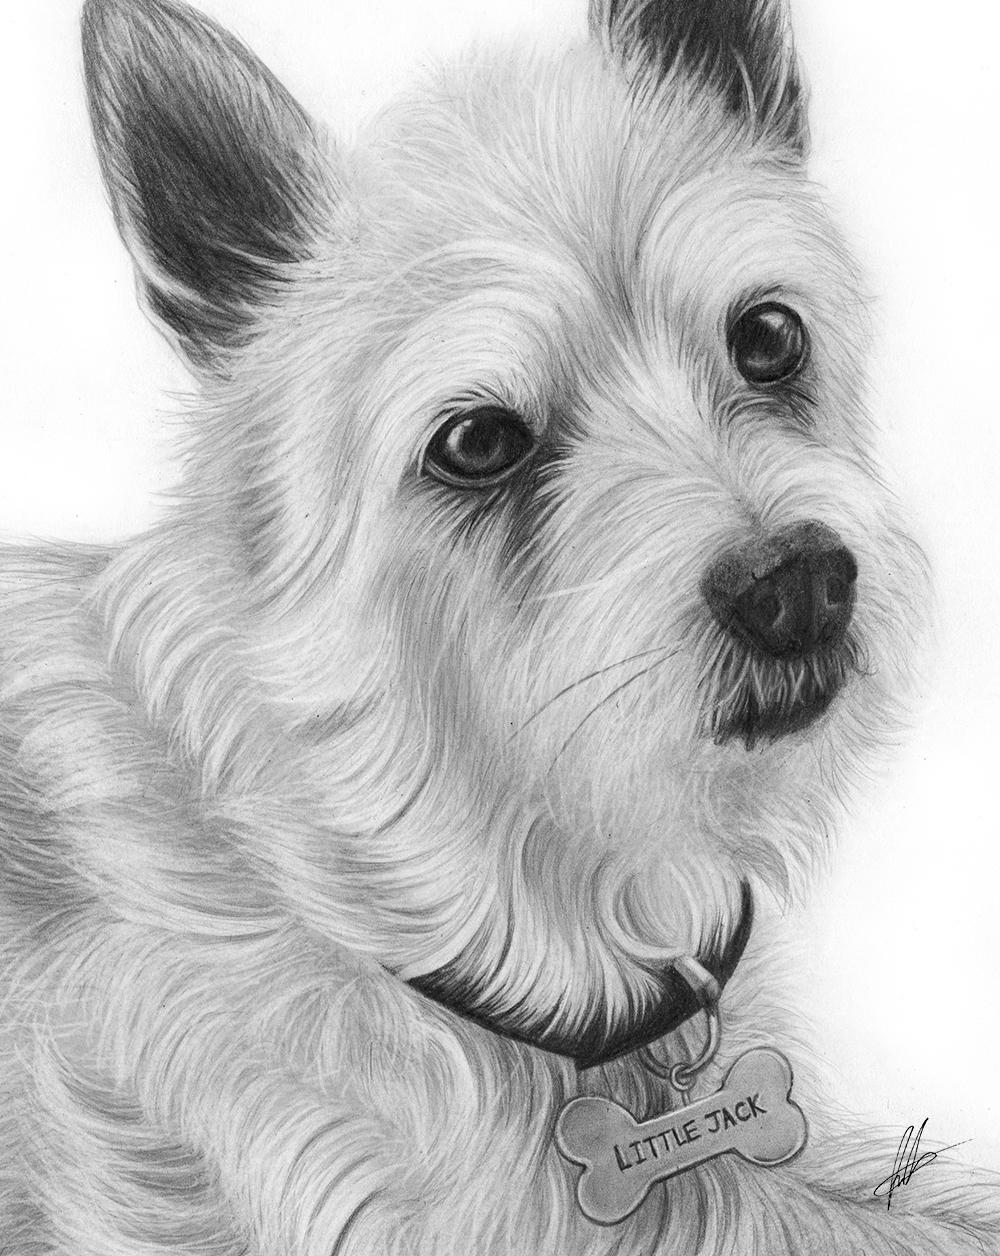 laura-eddy-drawing-little-jack-russell-closeup-01.jpg